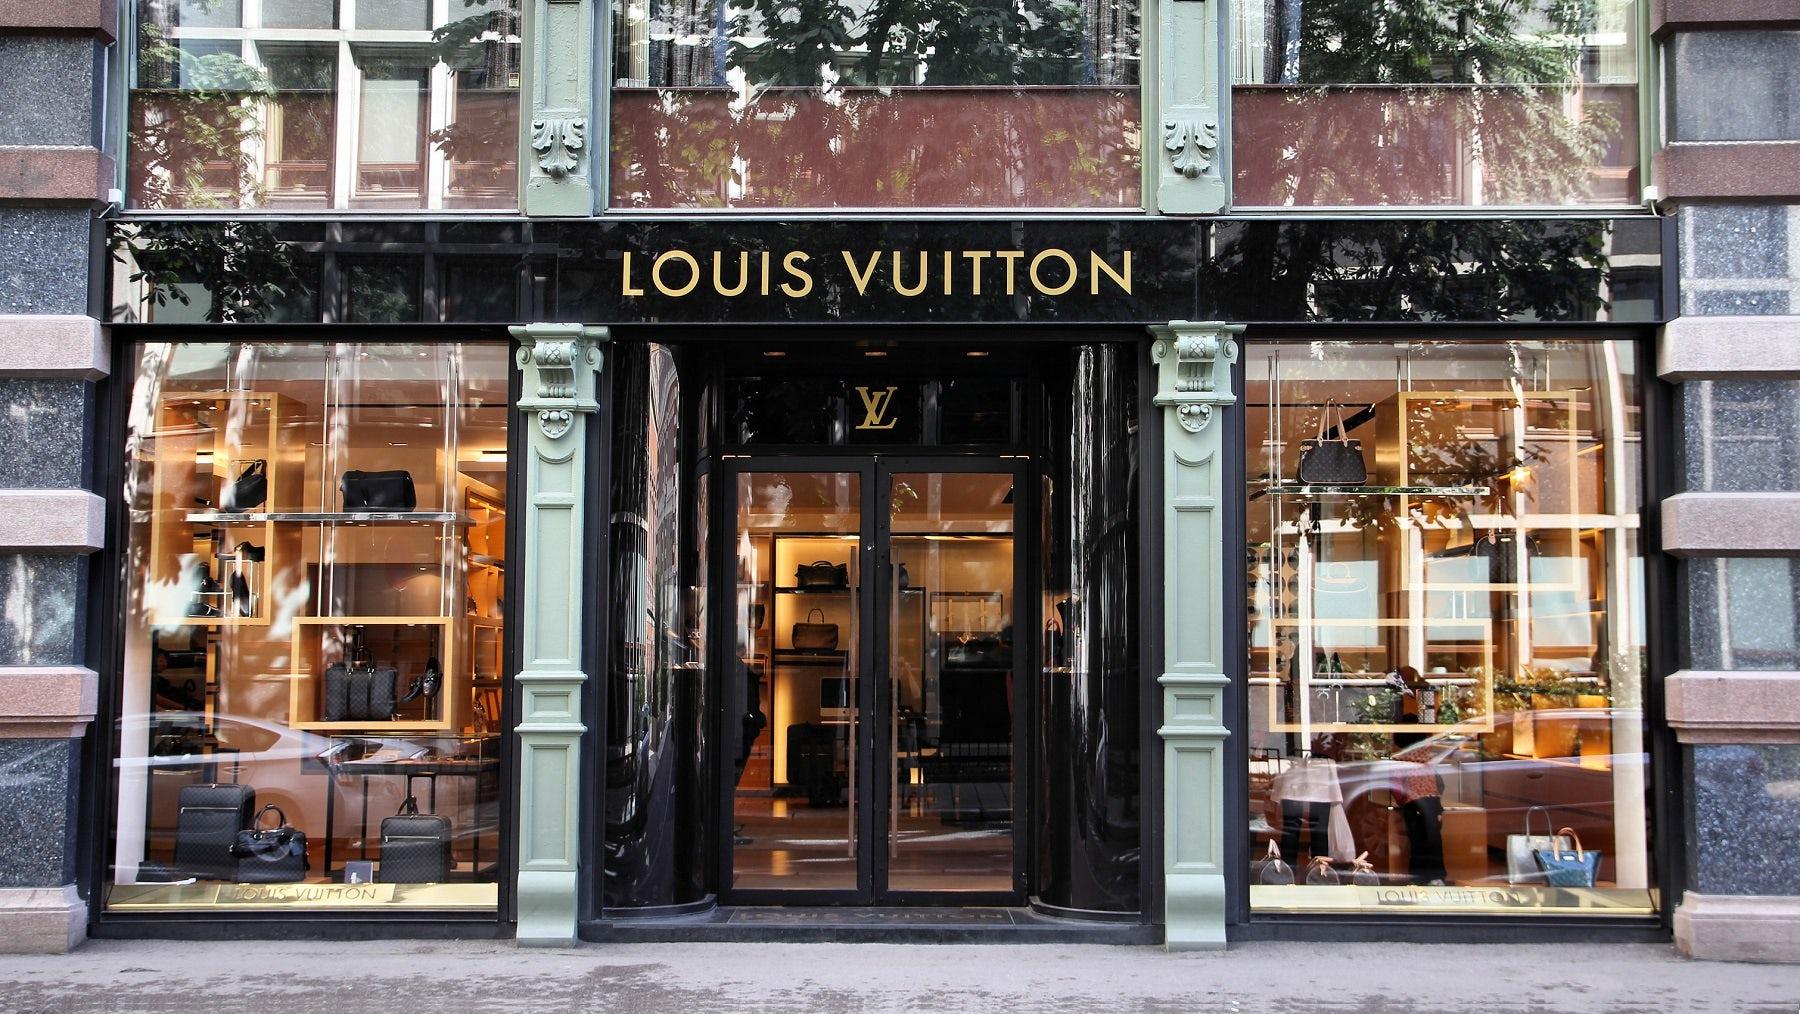 Louis Vuitton store   Source: Shutterstock